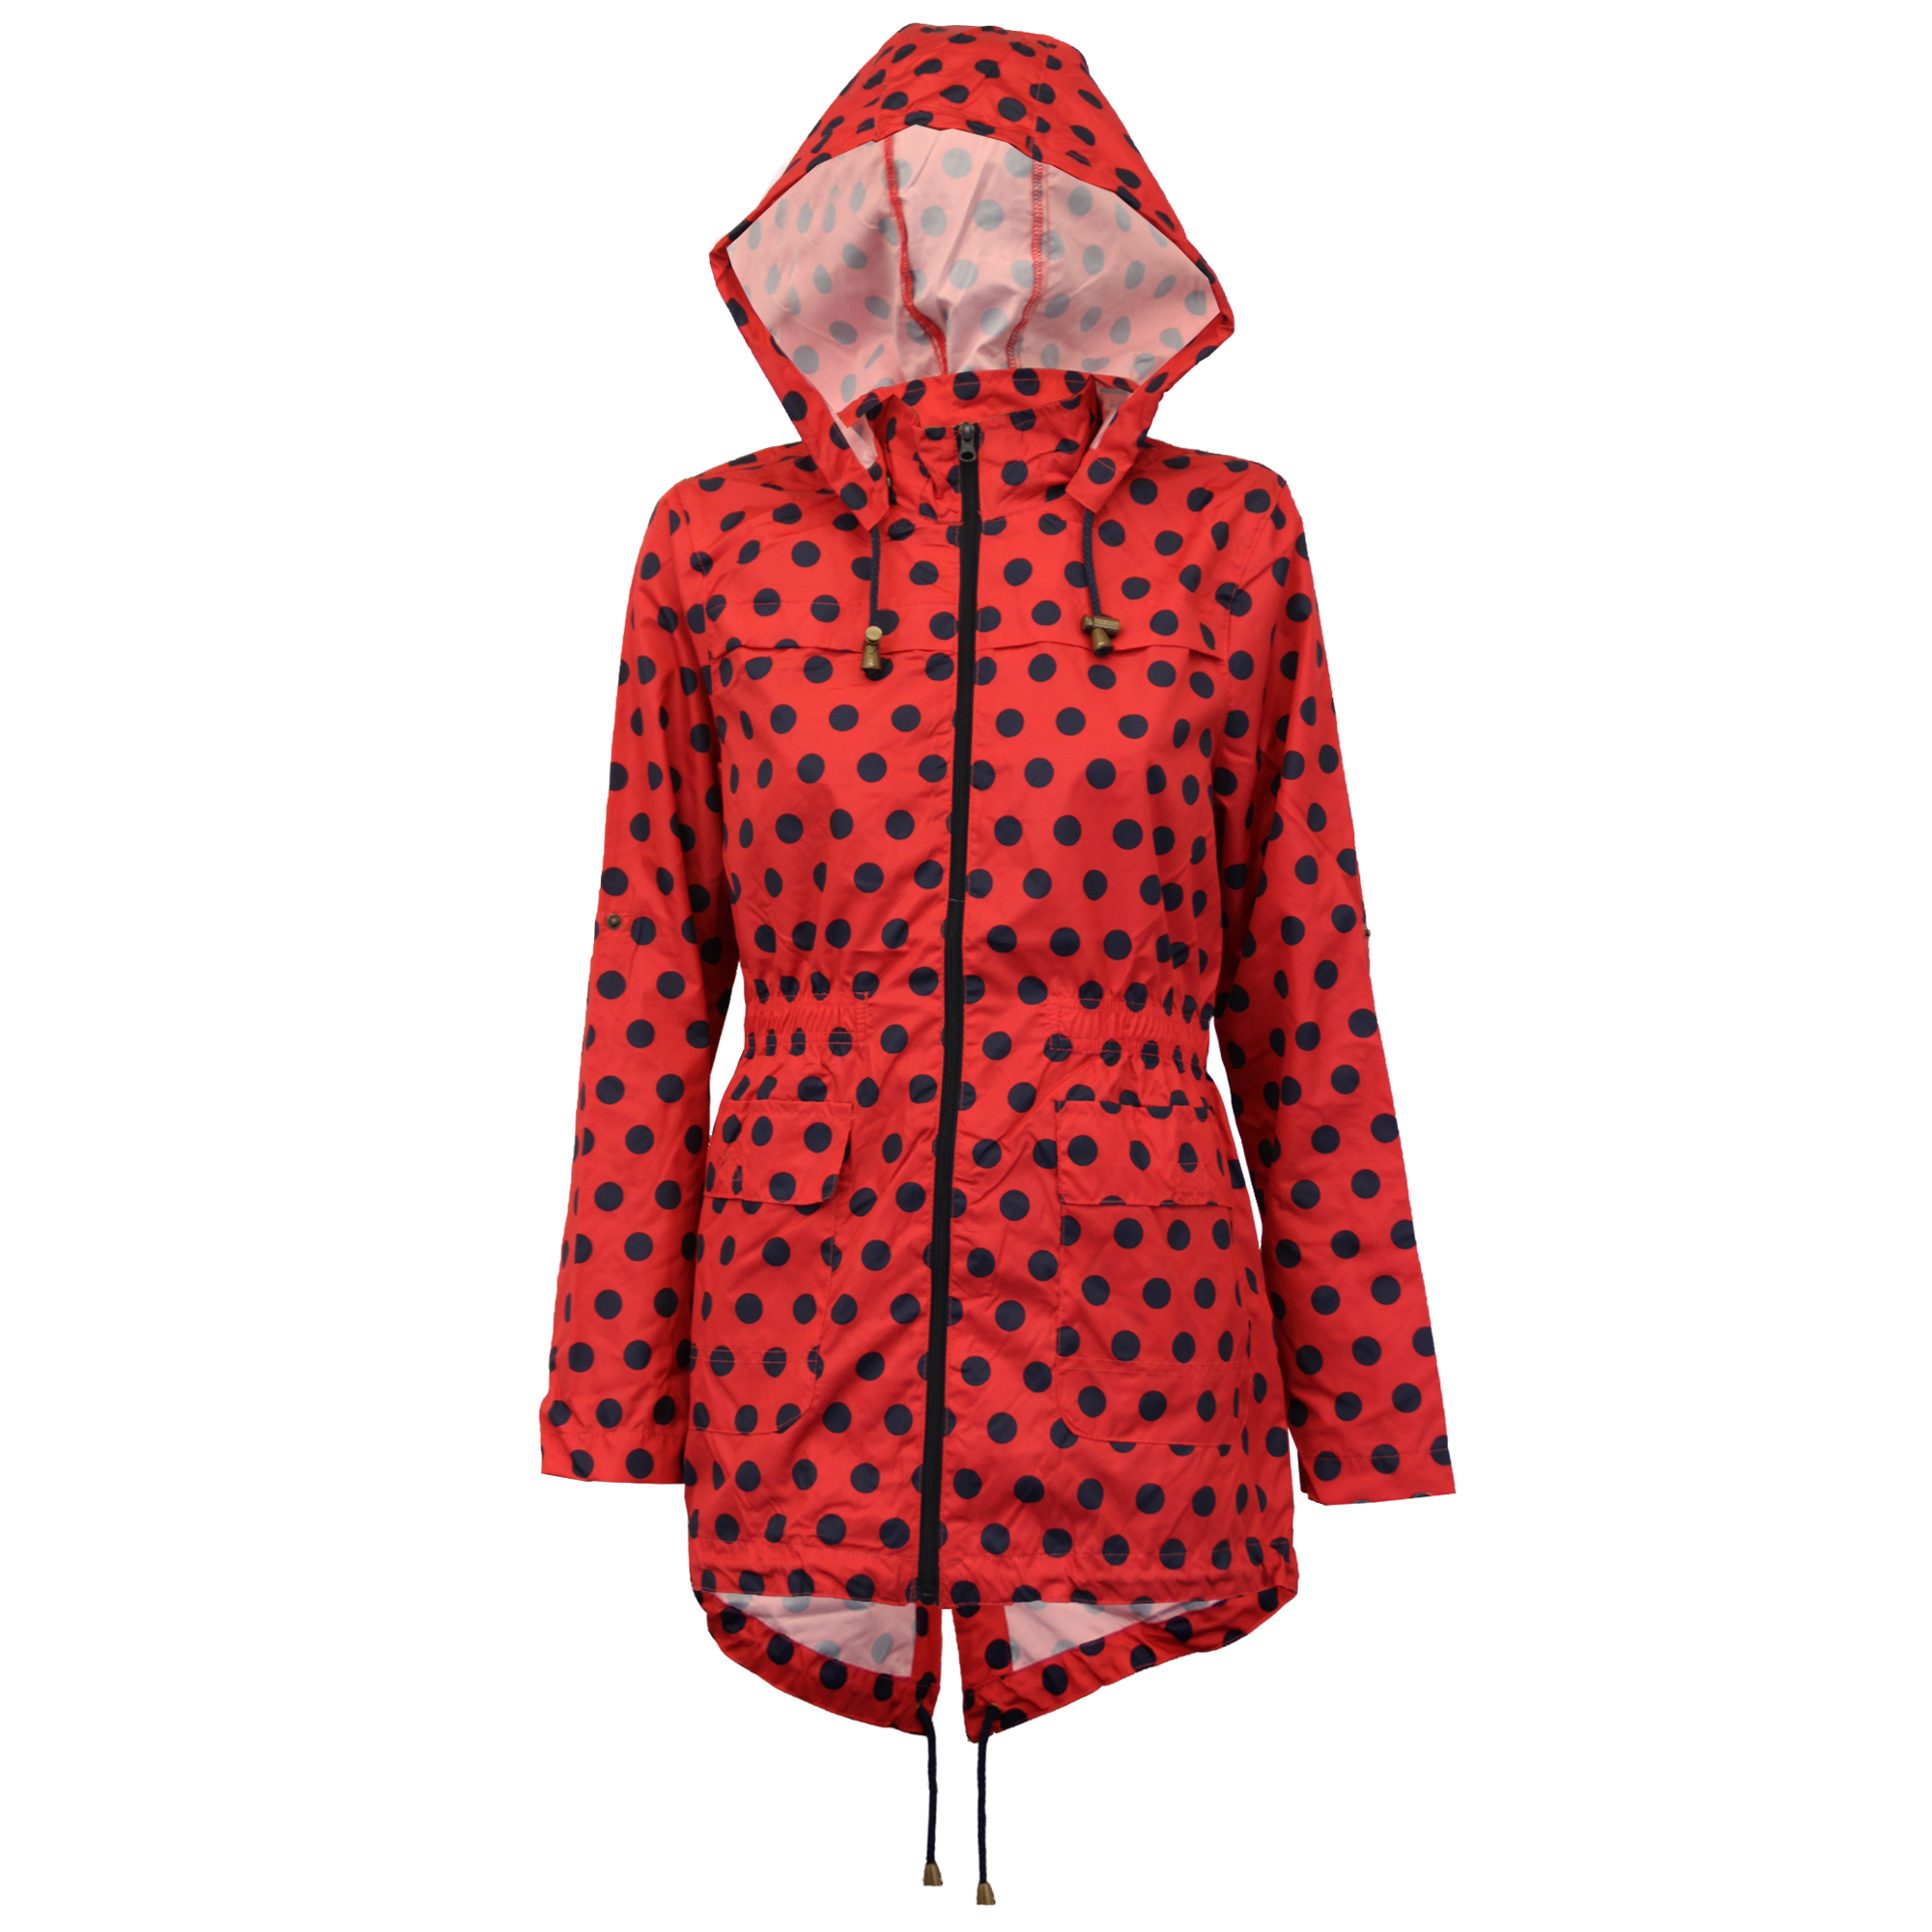 ladies womens kagool fish tail hooded polka dot jacket by Brave Soul